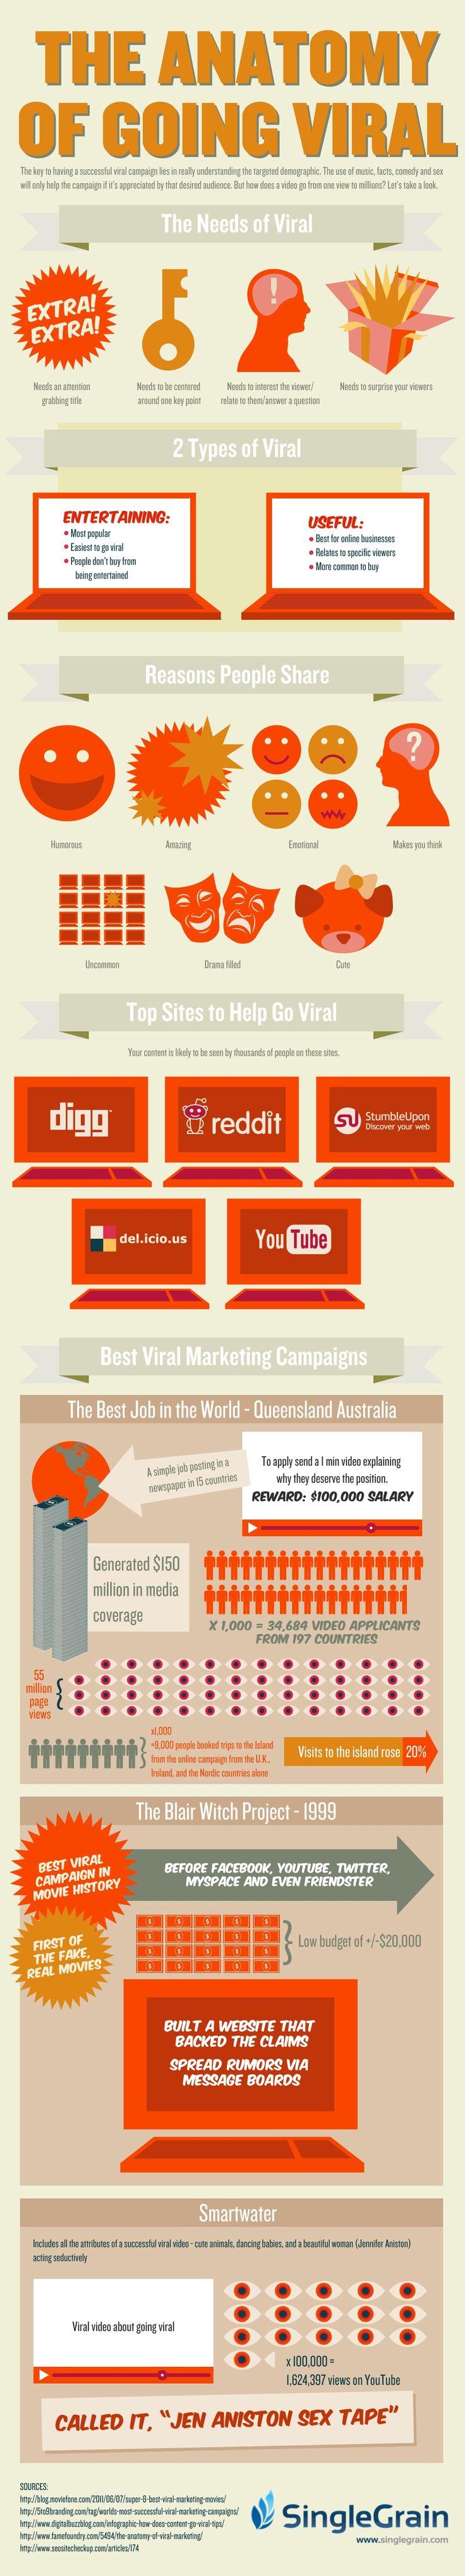 The anatomy of going viral: Webdesign, Internet Marketing, Social Media Marketing, Web Design, Anatomy, Viral Infographic, Secret Recipes, Business Marketing, Socialmedia